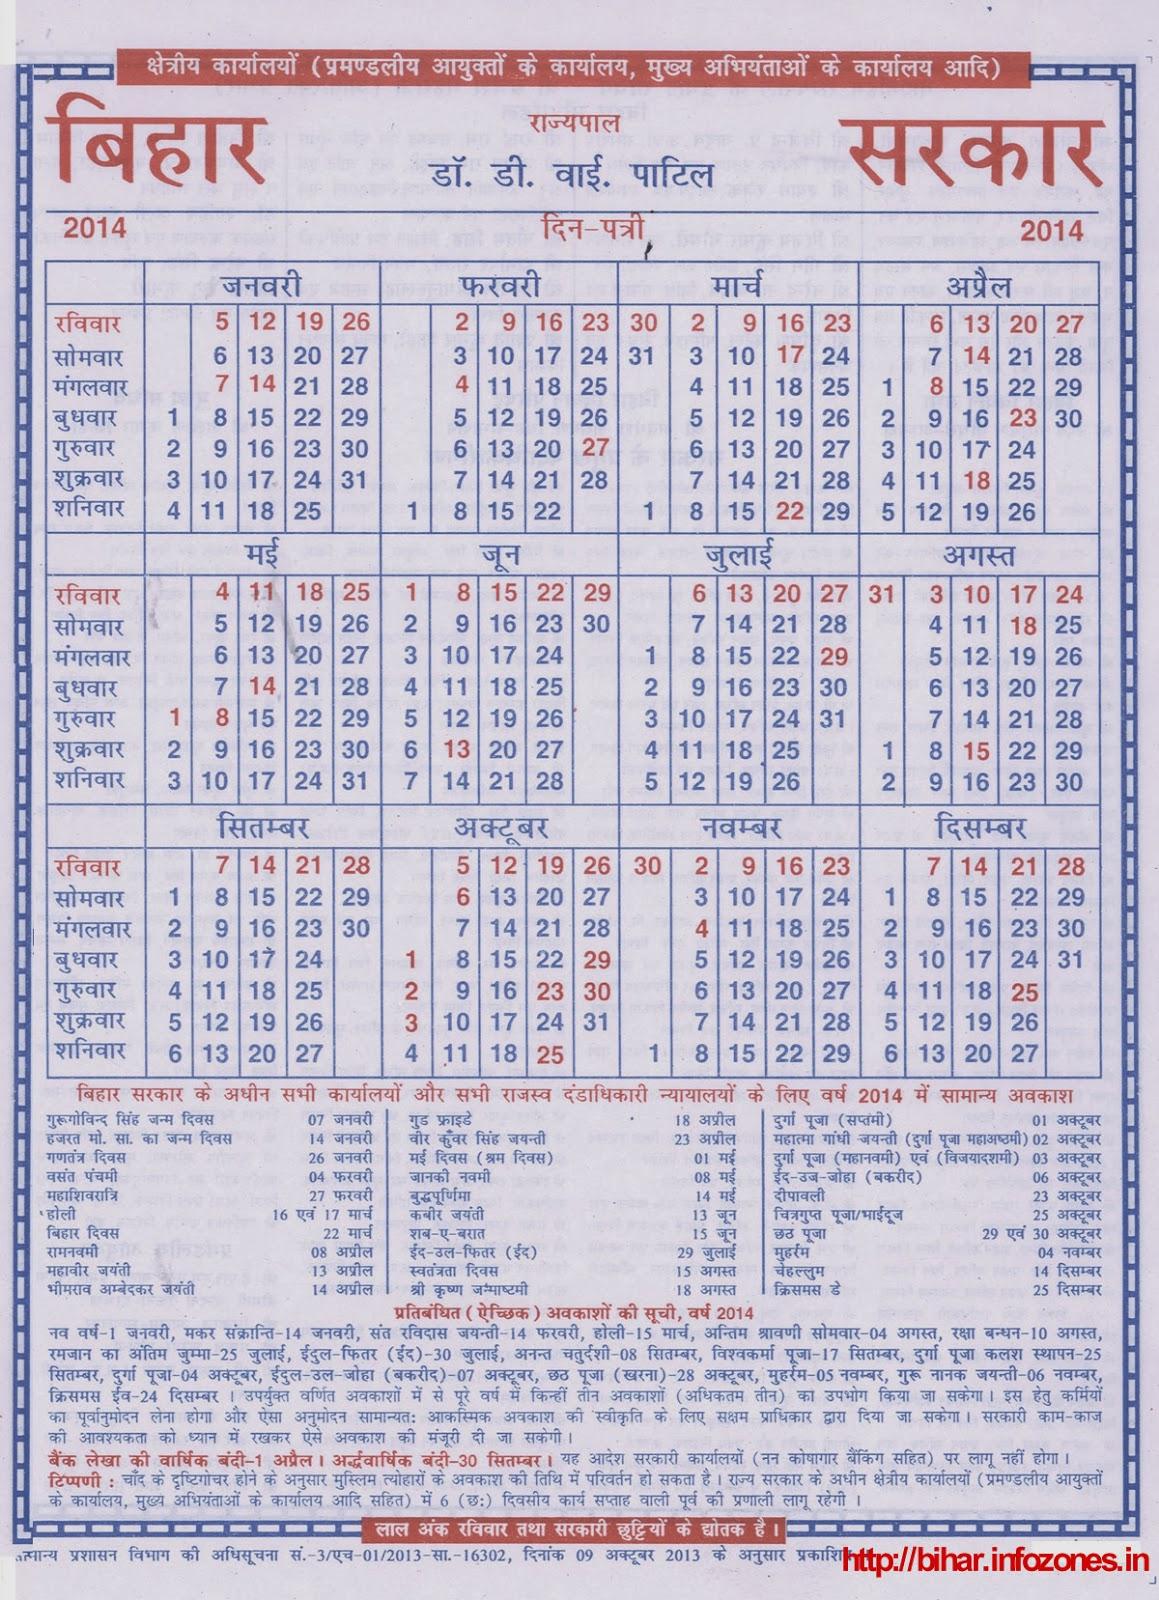 Bihar Government Calendar 2014 in Bihar Sarkar Calender